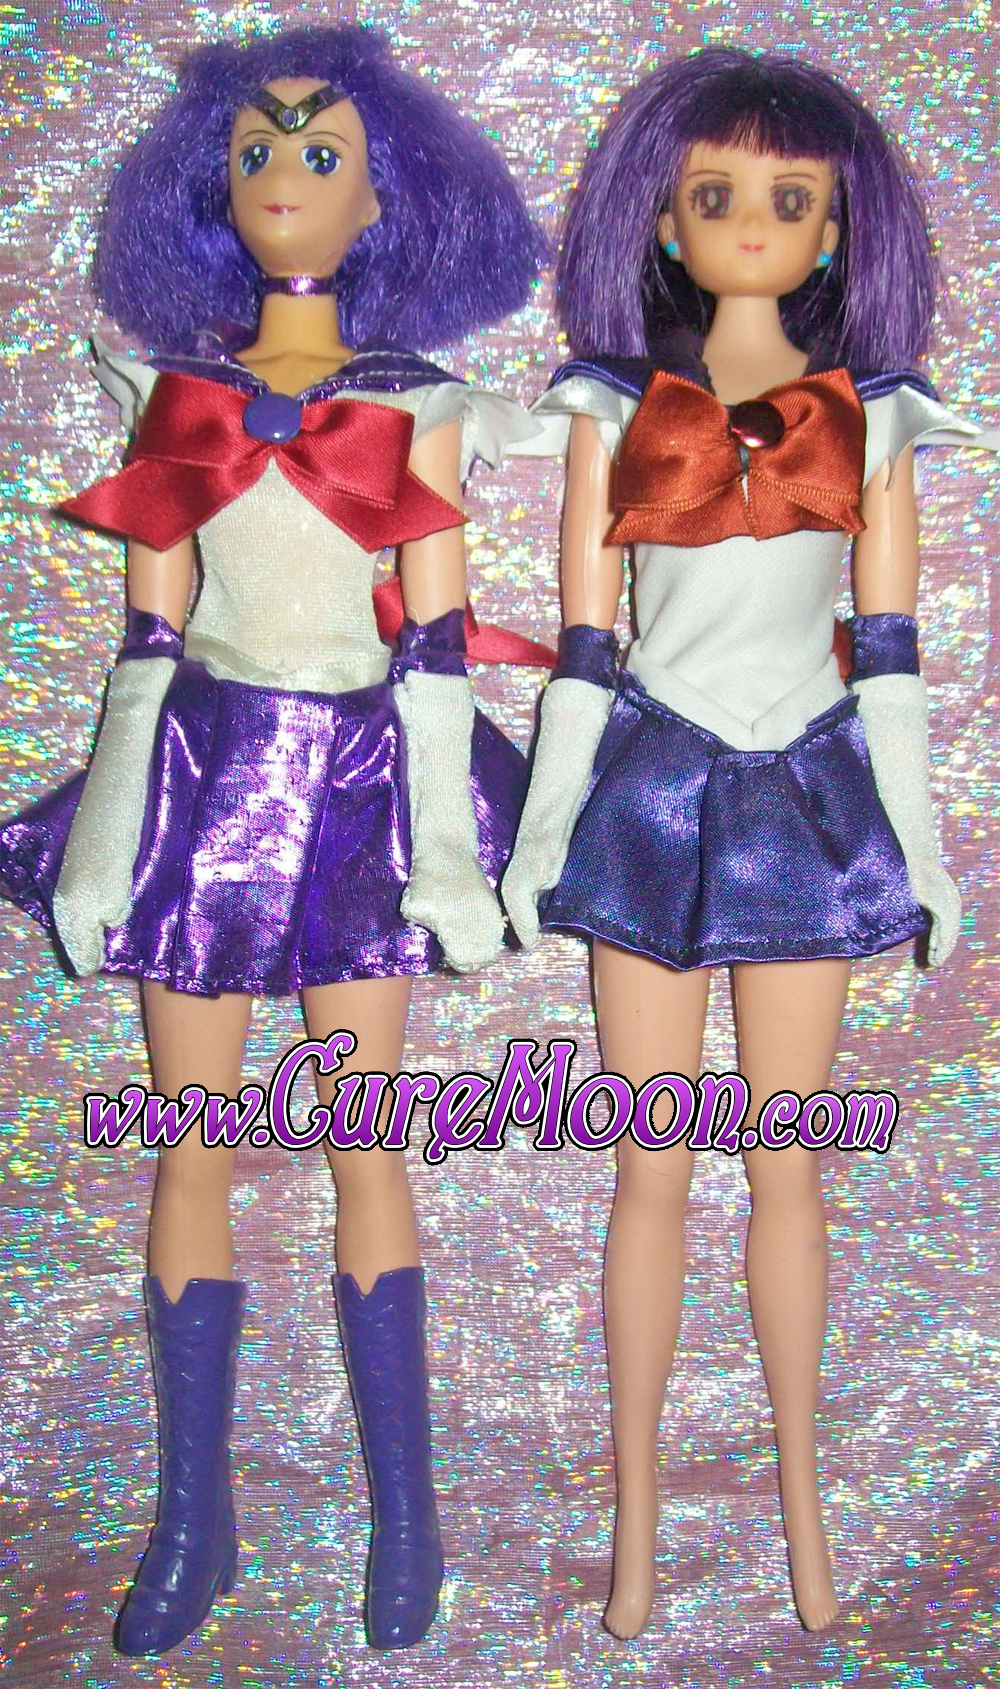 sailor-saturn-custom-ooak-curemoon